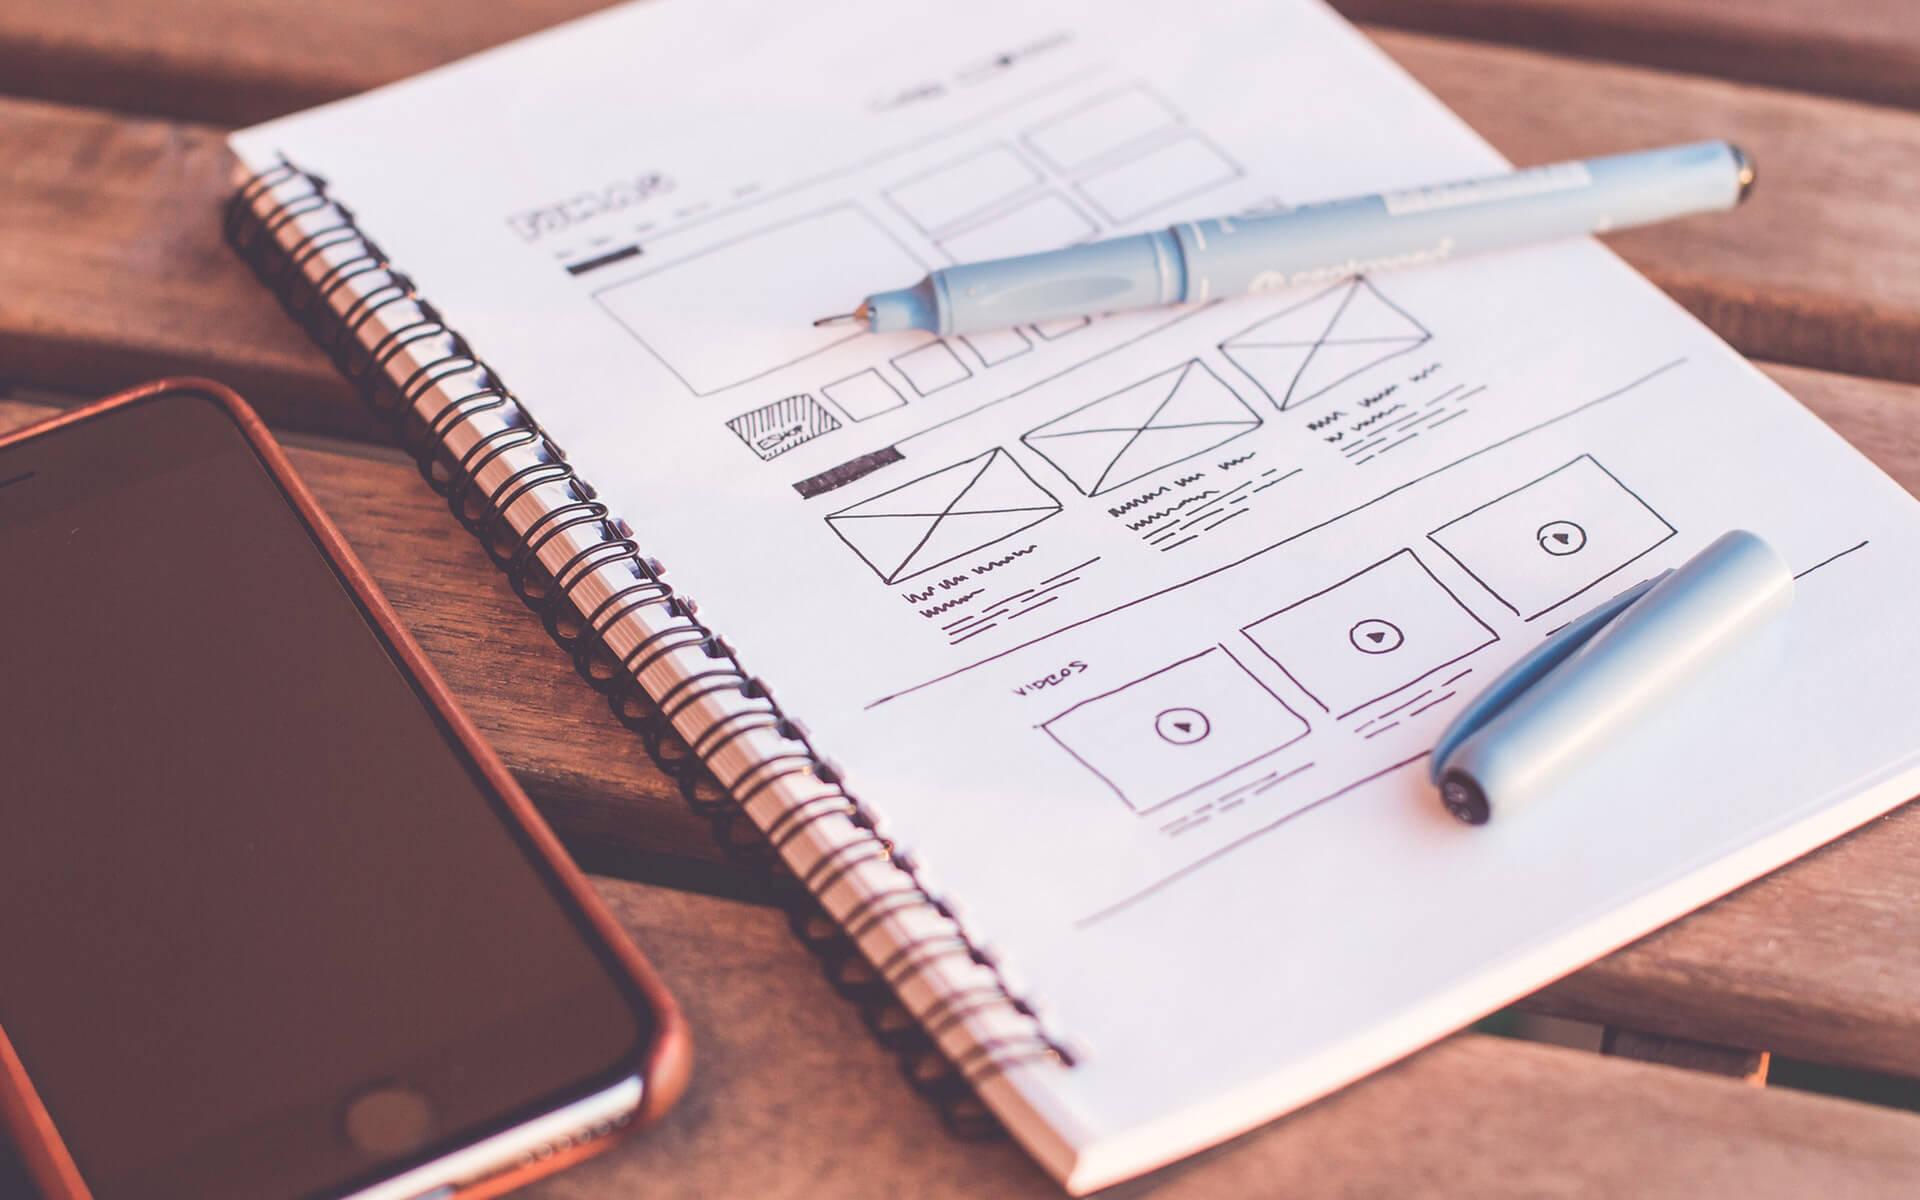 the process of web design